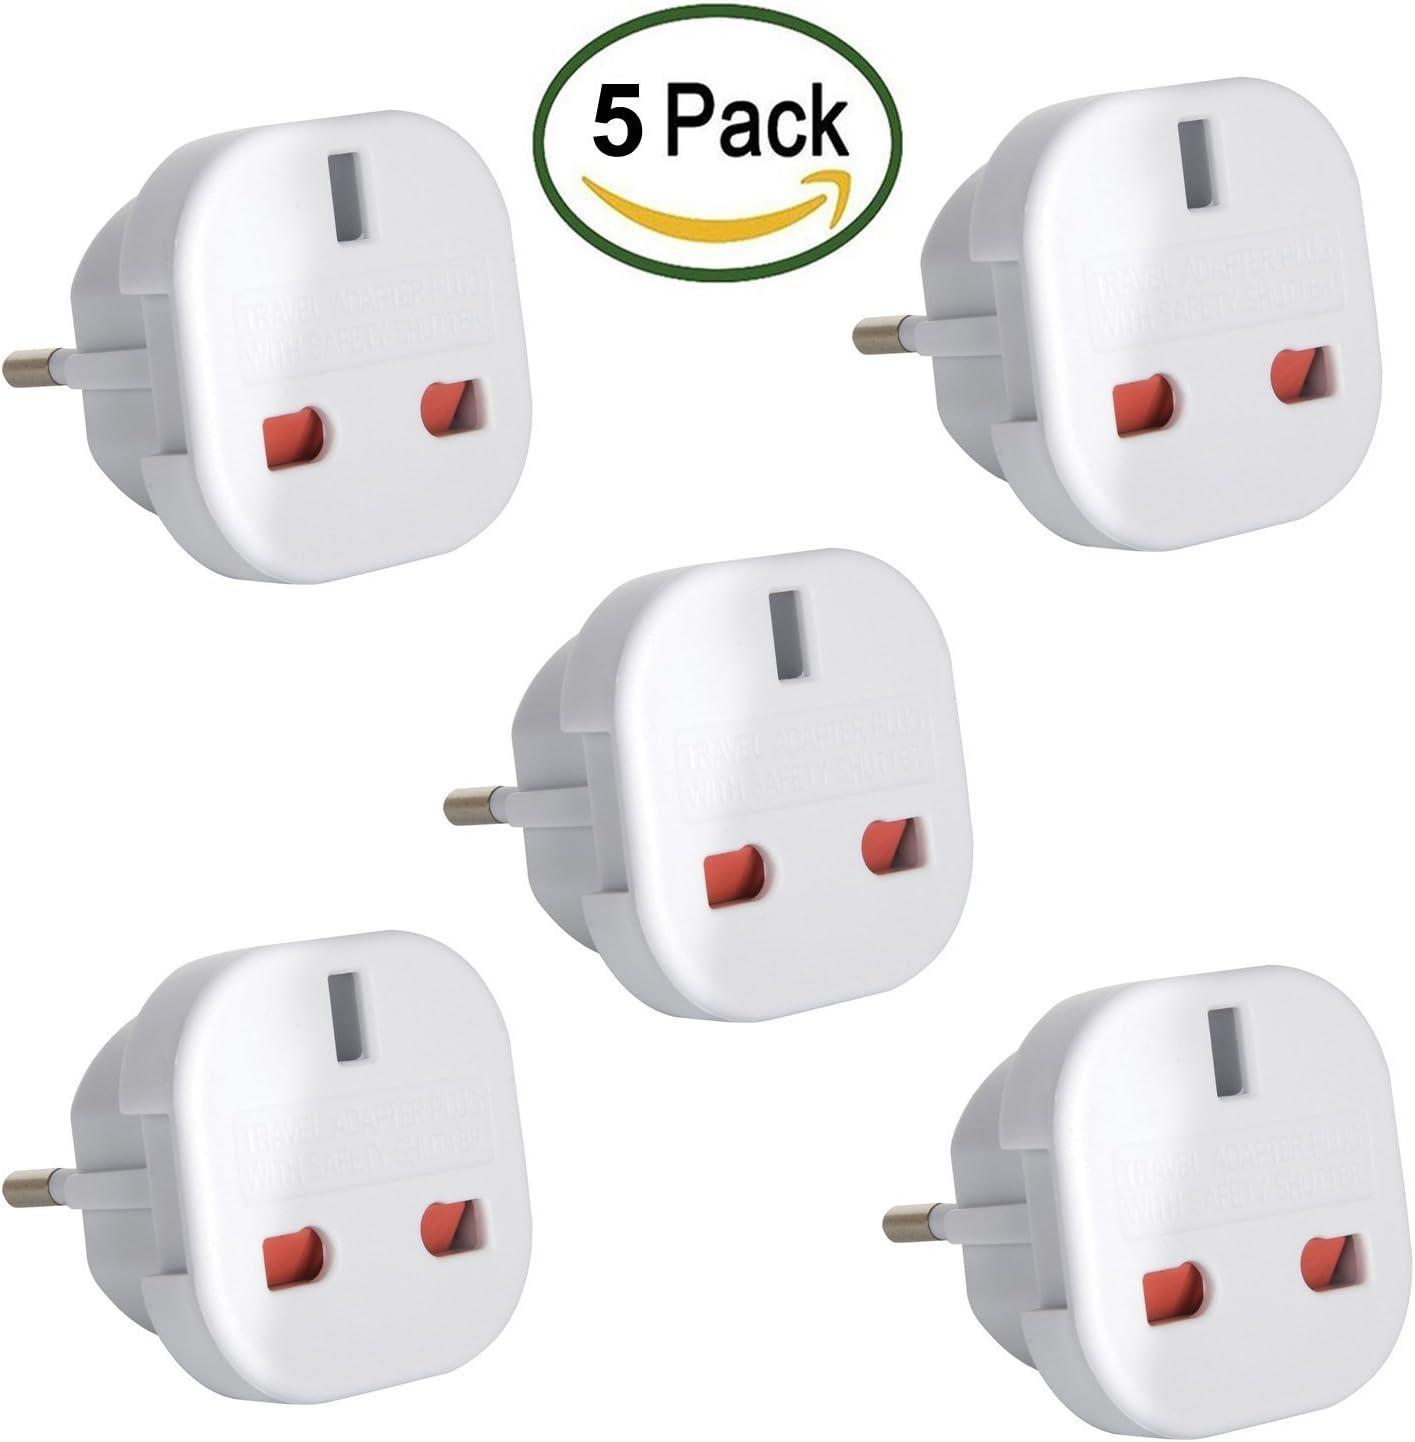 Travel Adapter UK to EU Euro European adapter White Plug 2 Pin Pack of 5